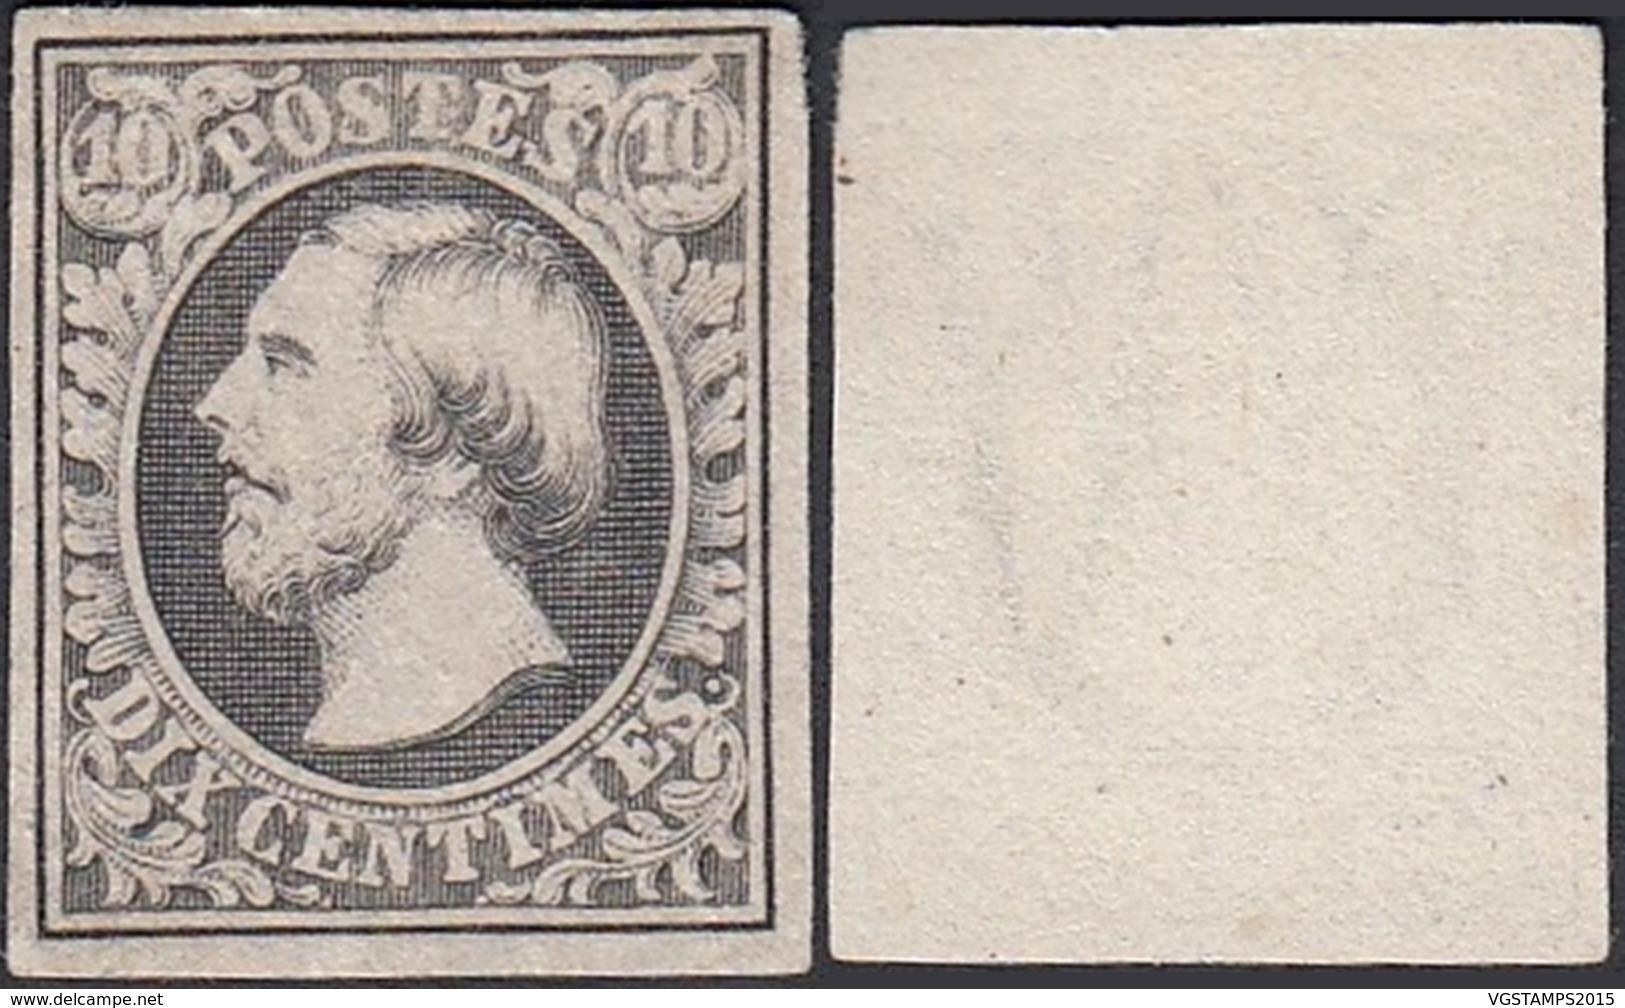 Luxembourg 1852 - Timbre Neuf Sans Gomme. Mi Nr.: 2 D. Prifix Nr.: 1 H + Certificat. (EB) DC-MV-415 - Luxembourg